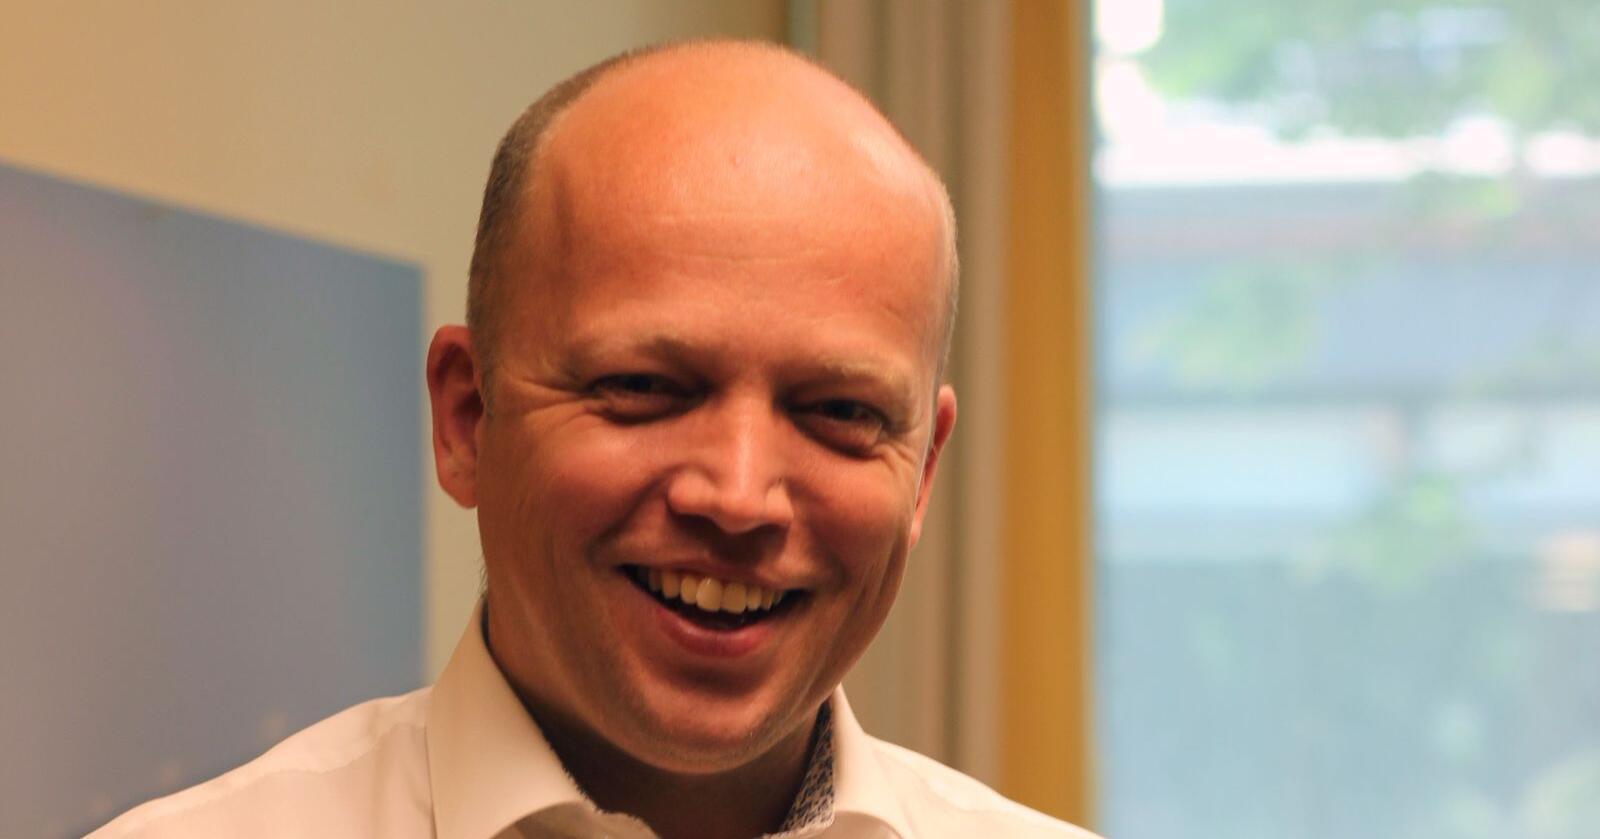 Partileder Trygve Slagsvold Vedum (Sp) i forkant av landsmøtet. Foto: Tone Magni Finstad Vestheim